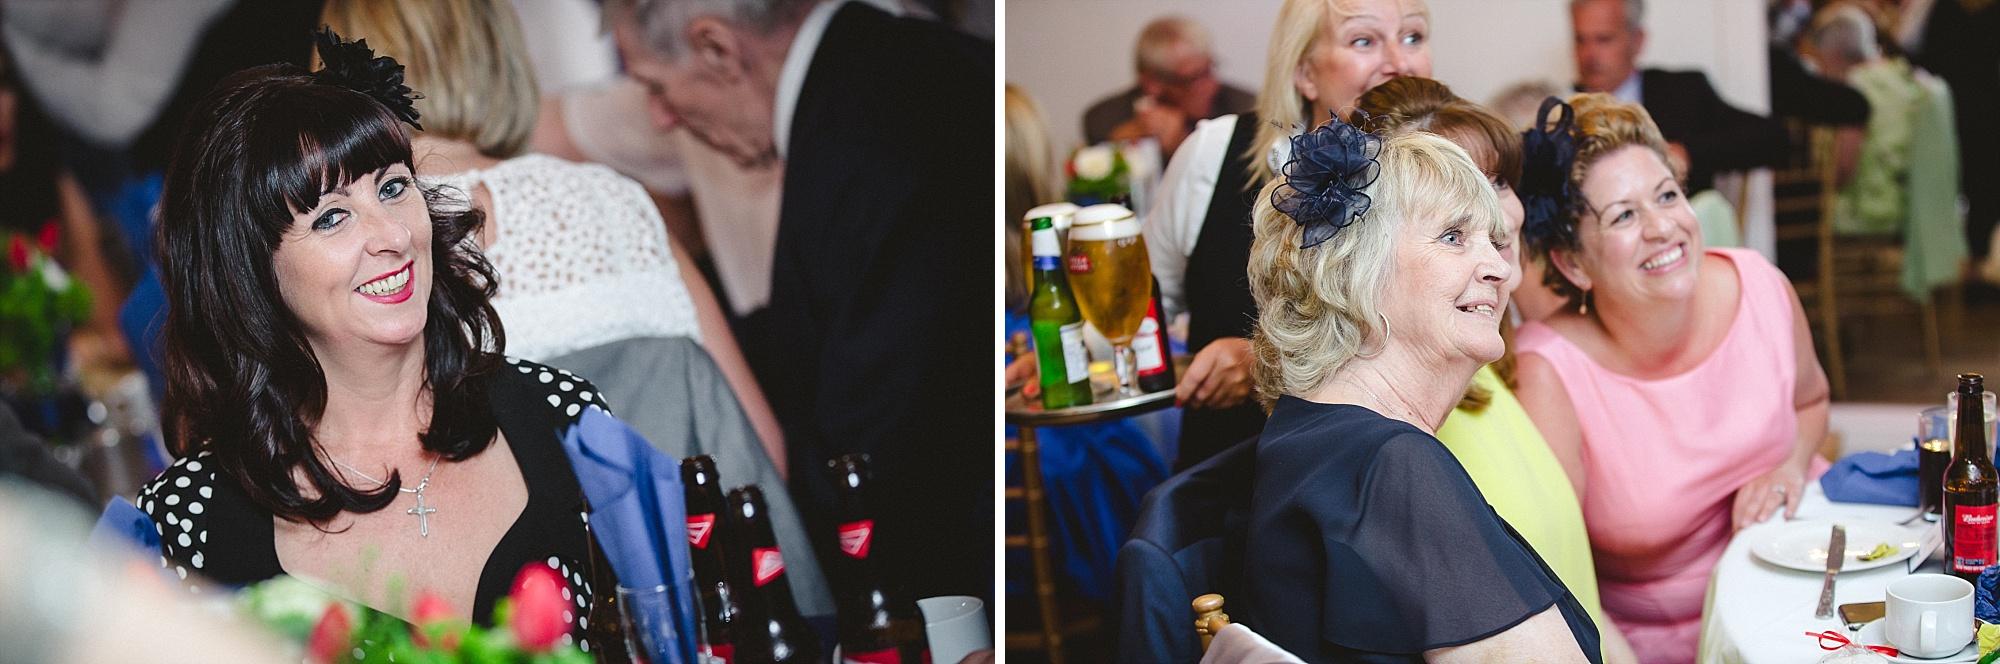 Langtons-Essex-Mod-Themed-Wedding_0056.jpg